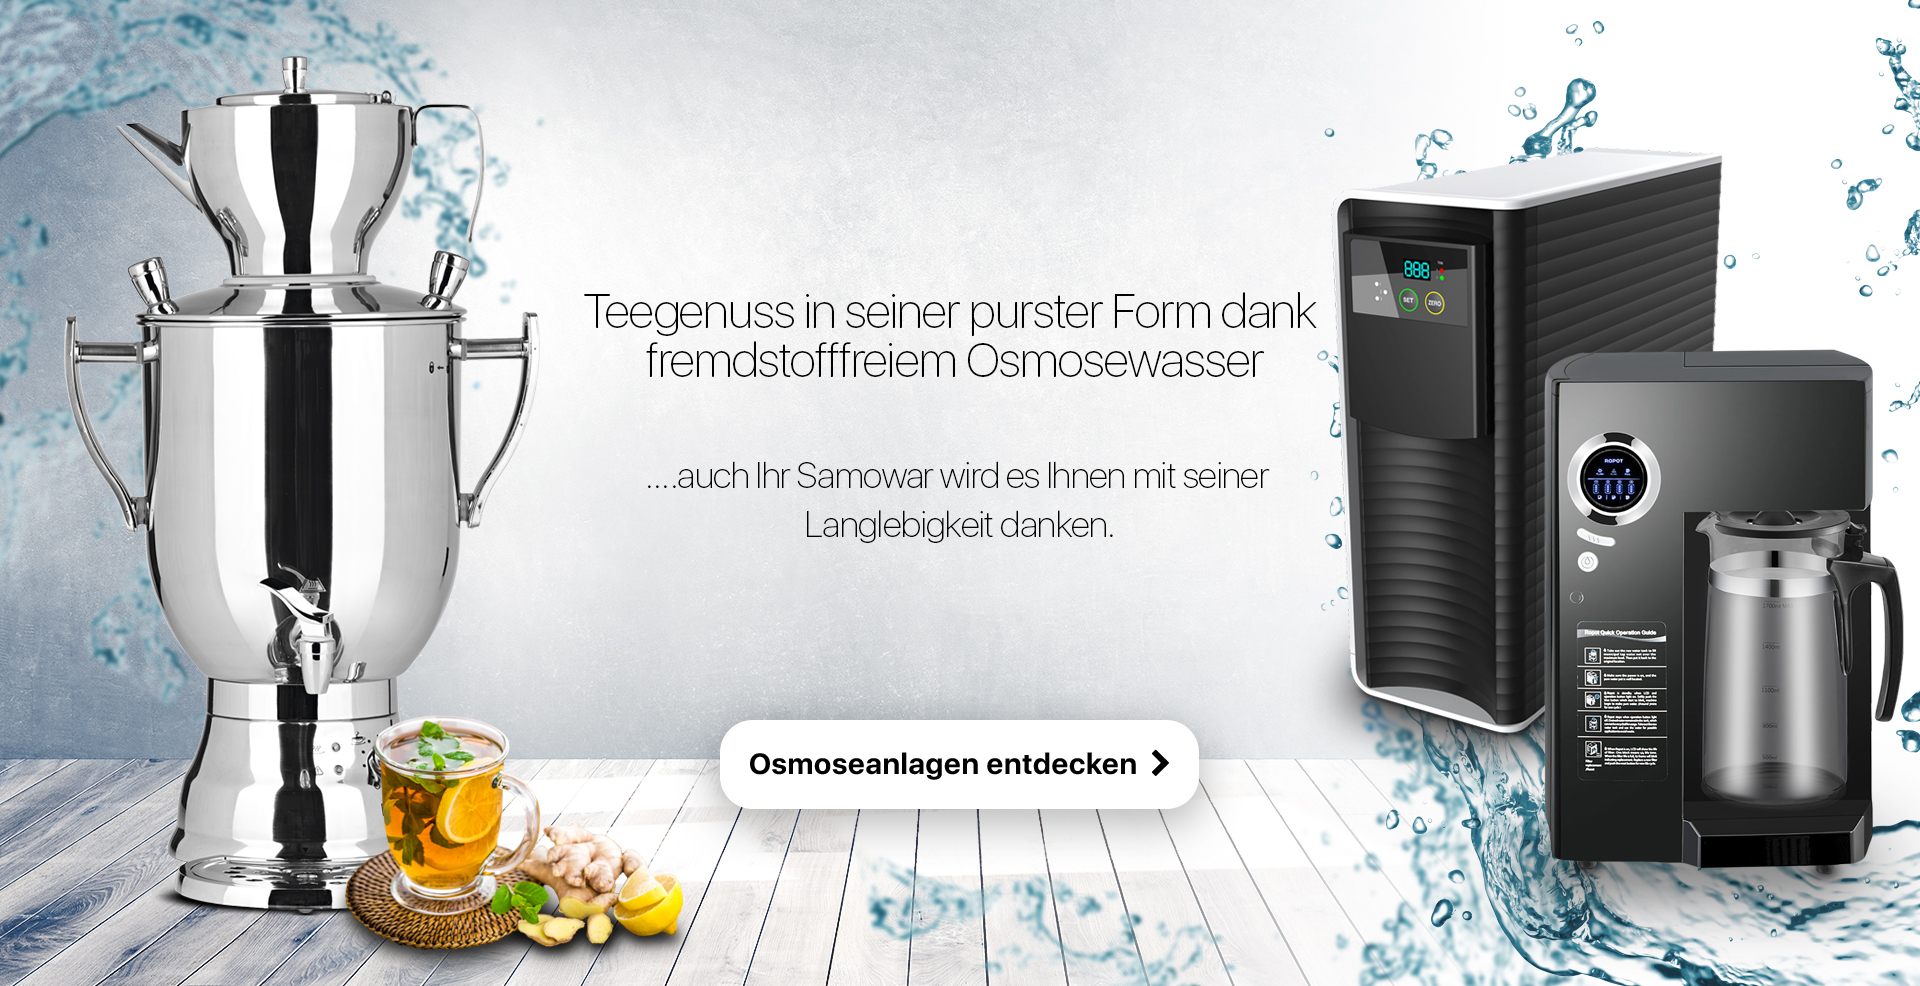 Osmosewasser_ohne-Samoware_07204